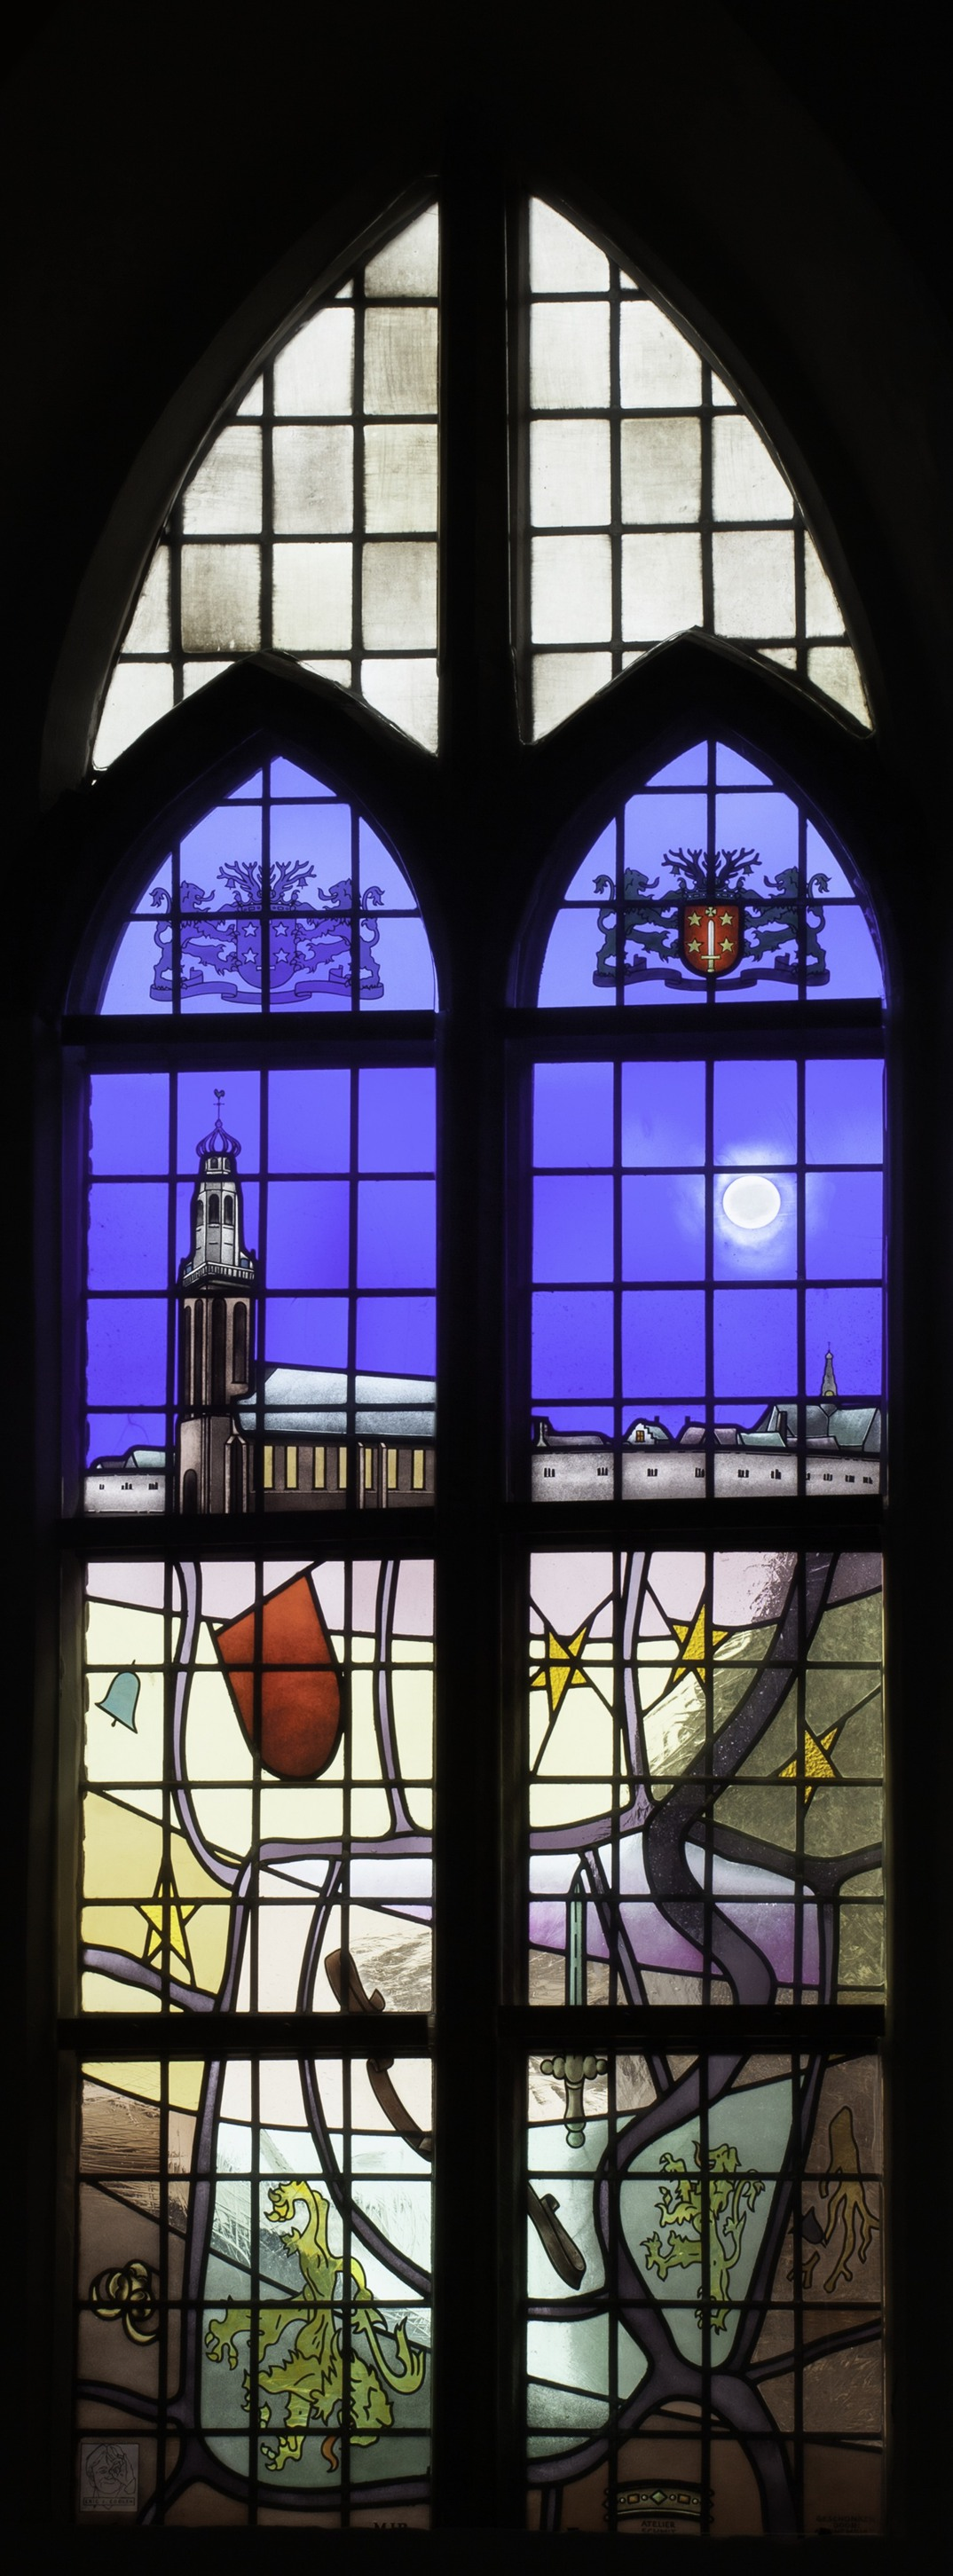 Middelburg Archives - Glas in lood Atelier SchmitGlas in lood ...